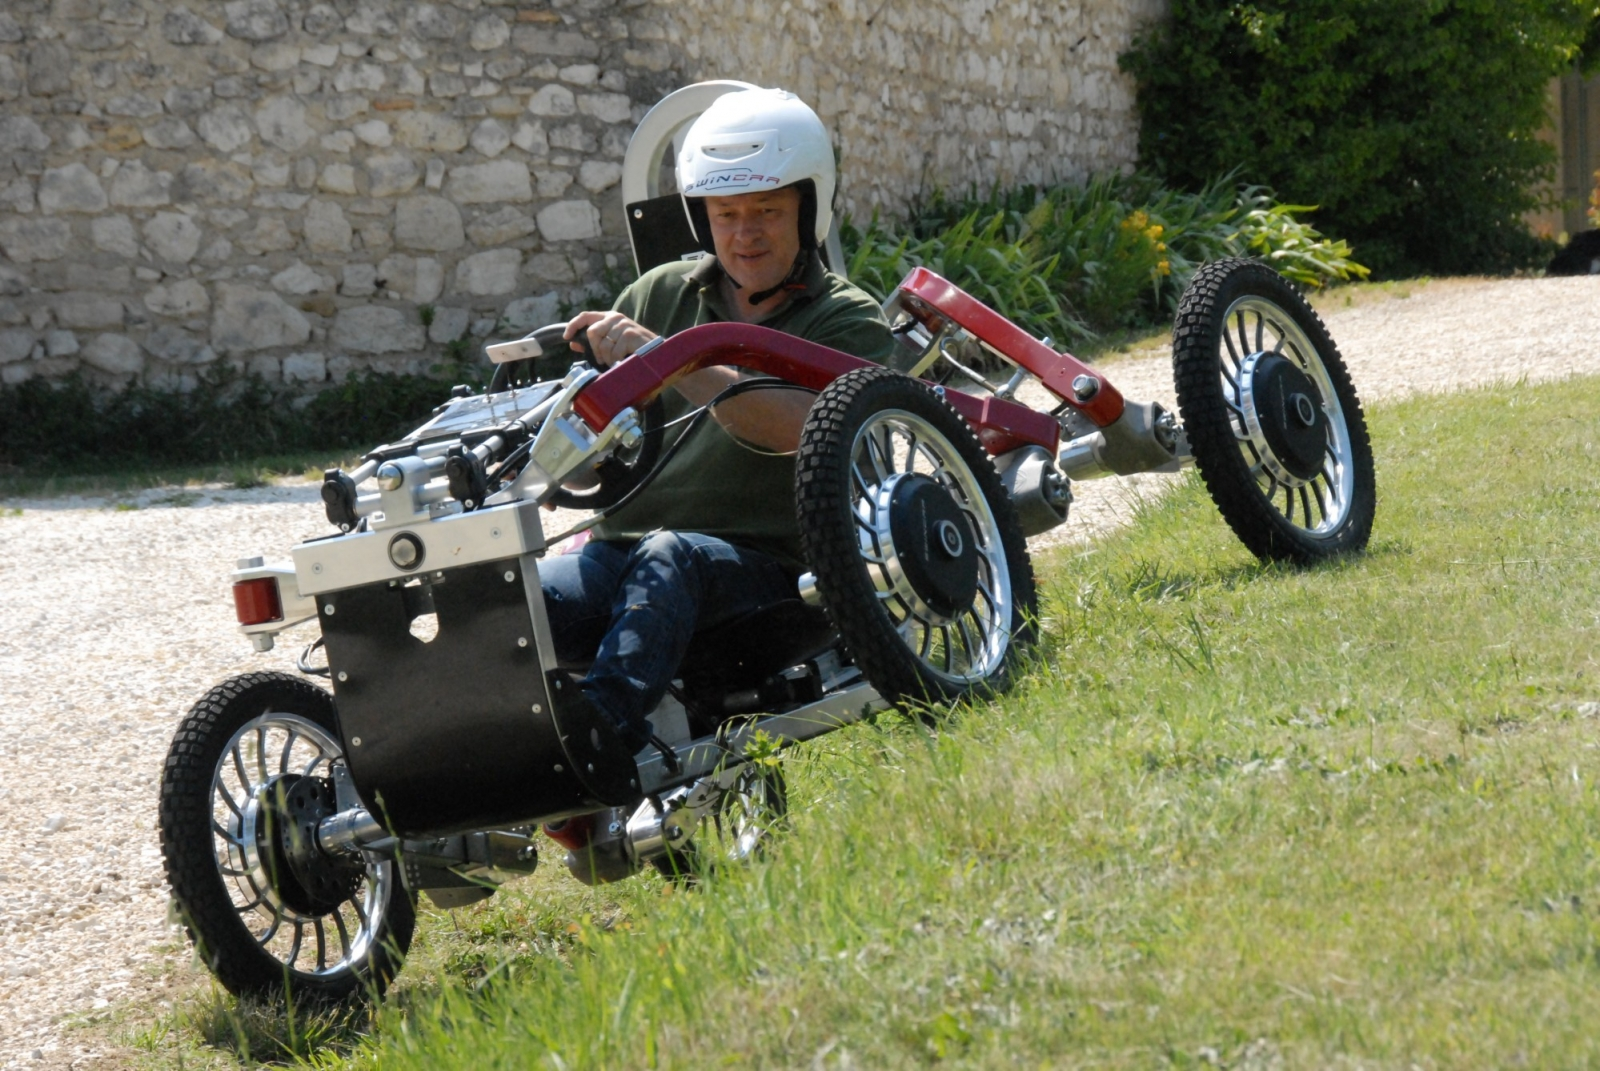 Swincar is a four wheel drive vehicle